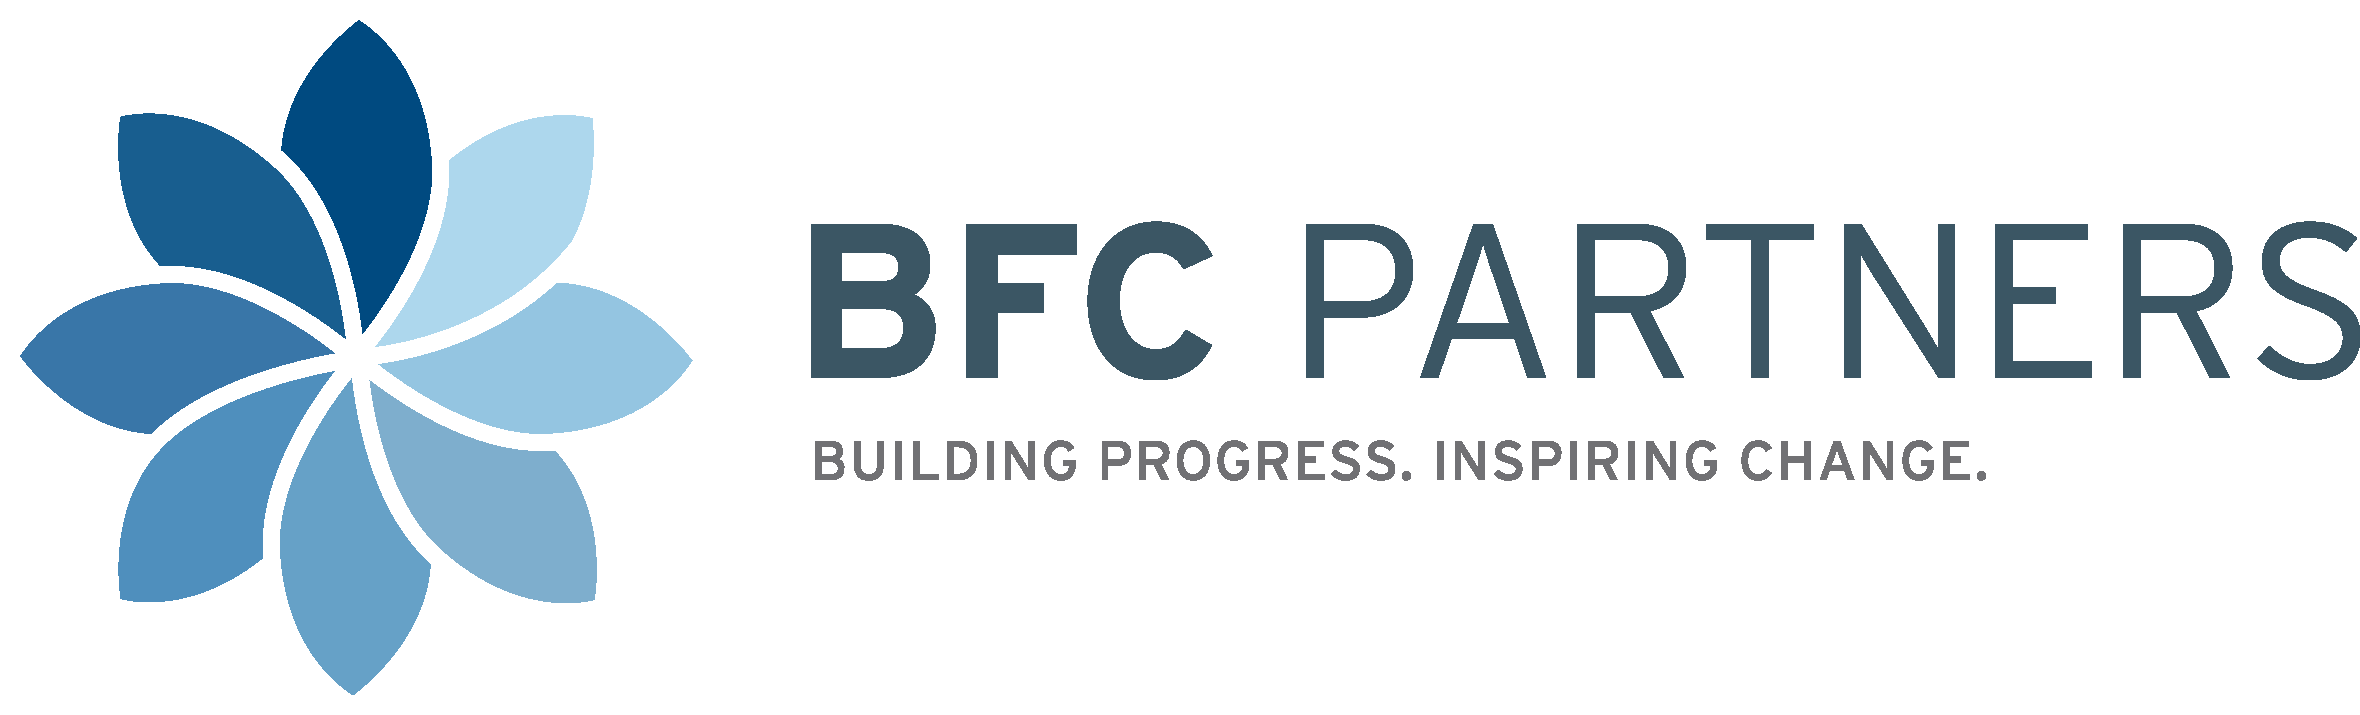 BFC Partners